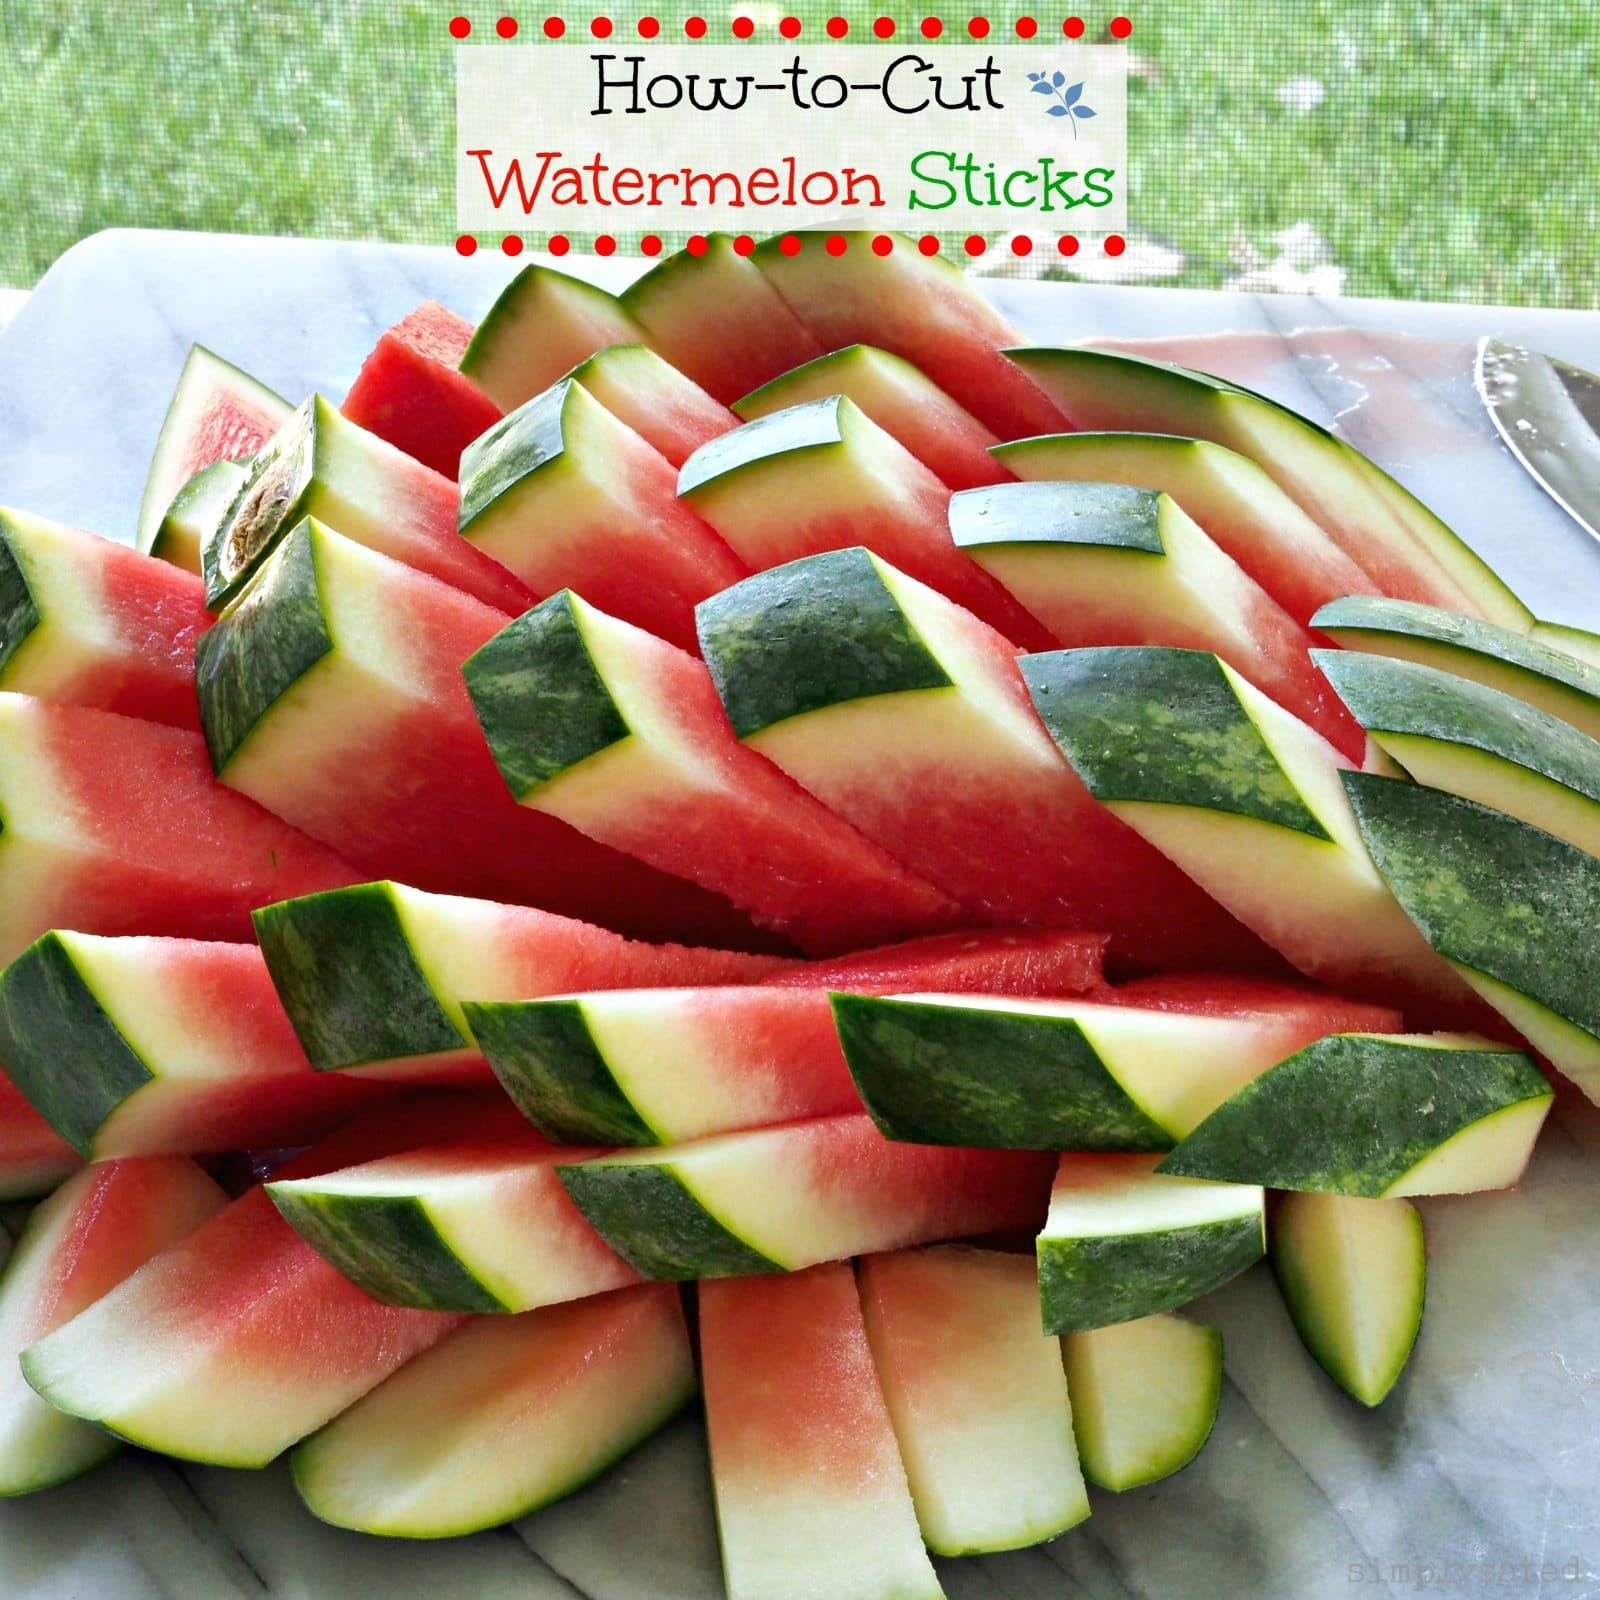 how to cut watermelon sticks